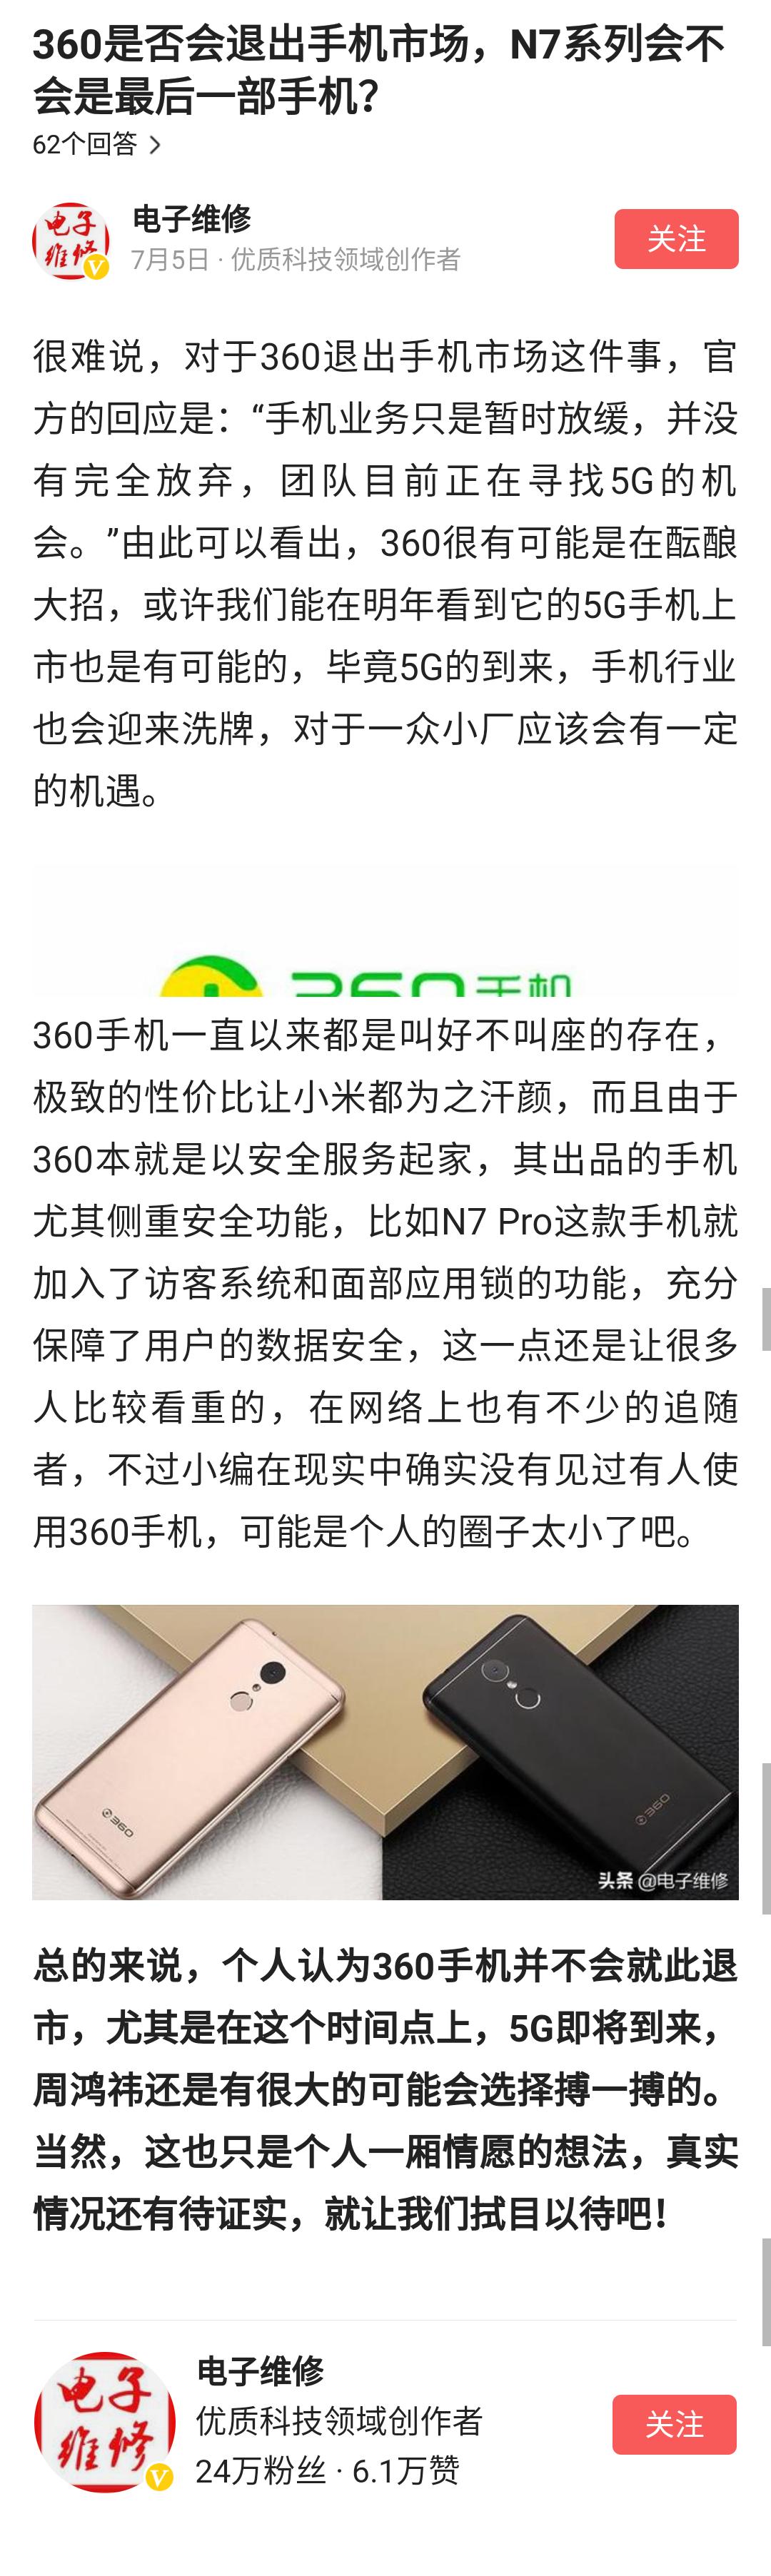 Screenshot_2019-09-07-11-53-45.png